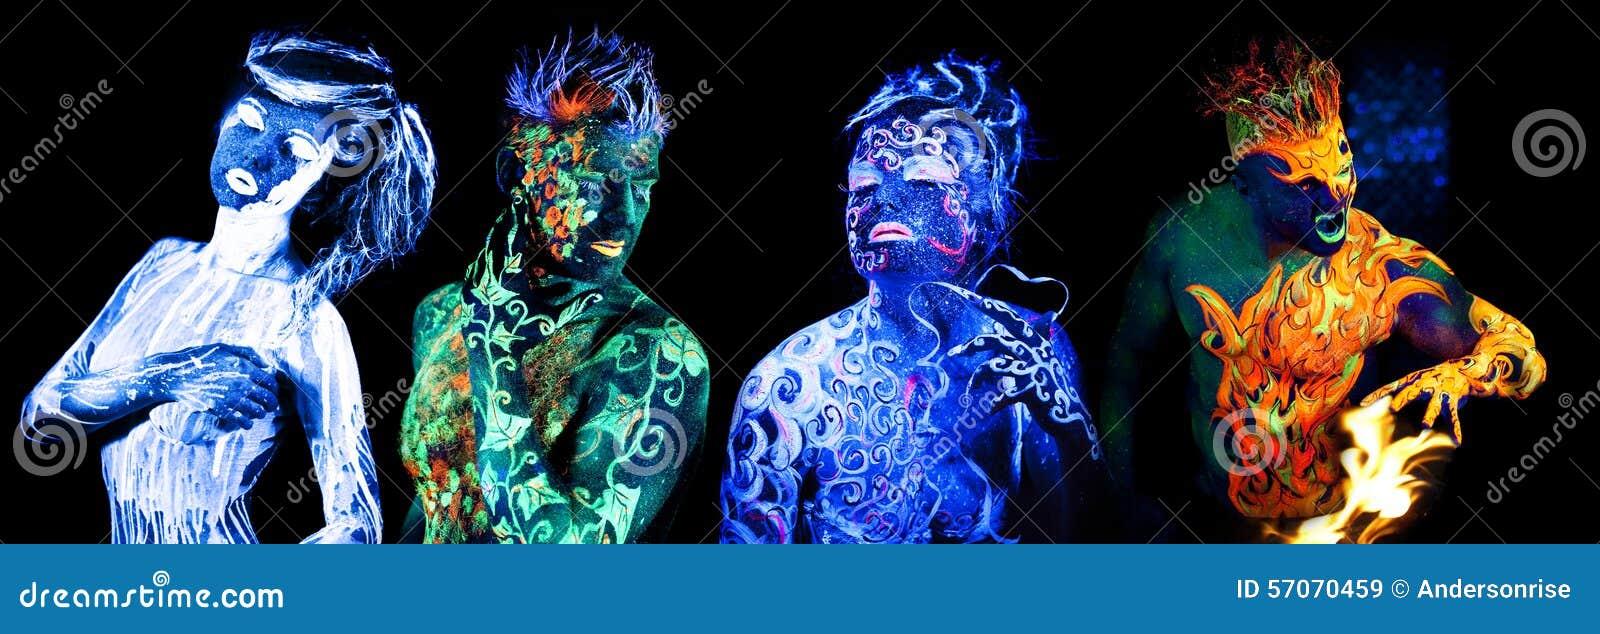 Quatro elementos Arte corporal que incandesce na luz ultravioleta